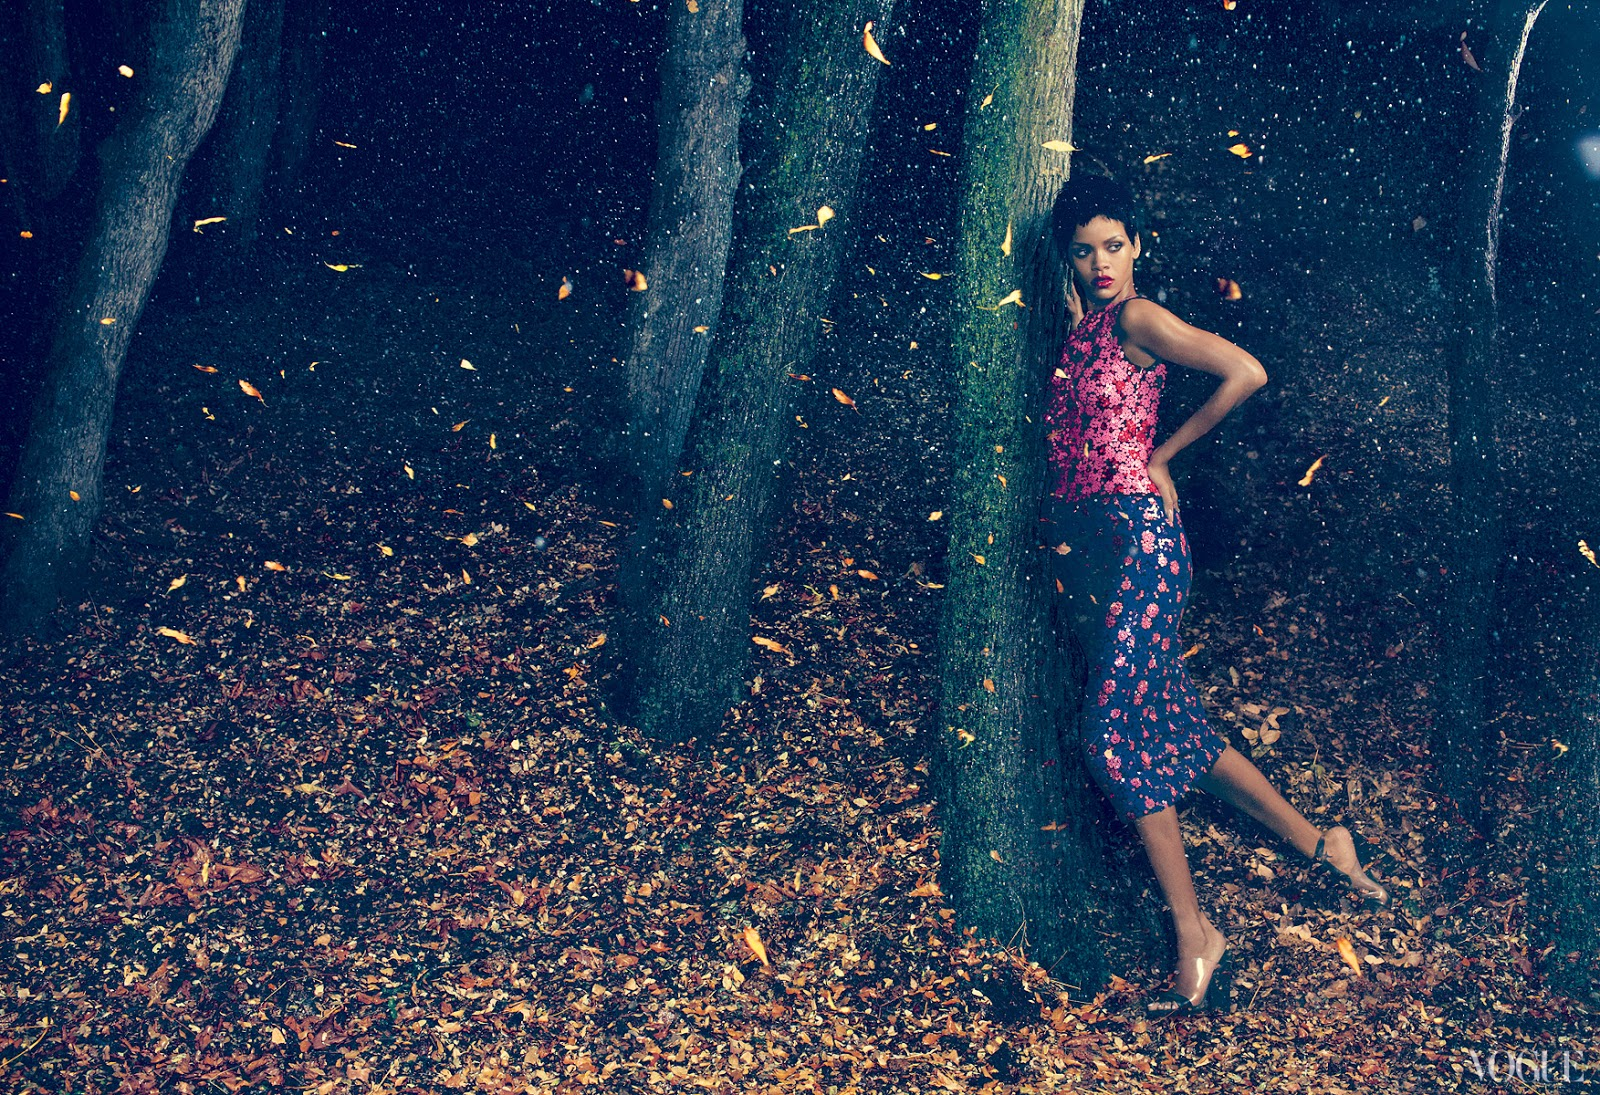 http://4.bp.blogspot.com/-sXNsf608_DI/UHwHzf4J-7I/AAAAAAAATVY/70PTbjh97LE/s1600/Rihanna+-+Vogue+magazine+November+2012+issue+-03.jpg